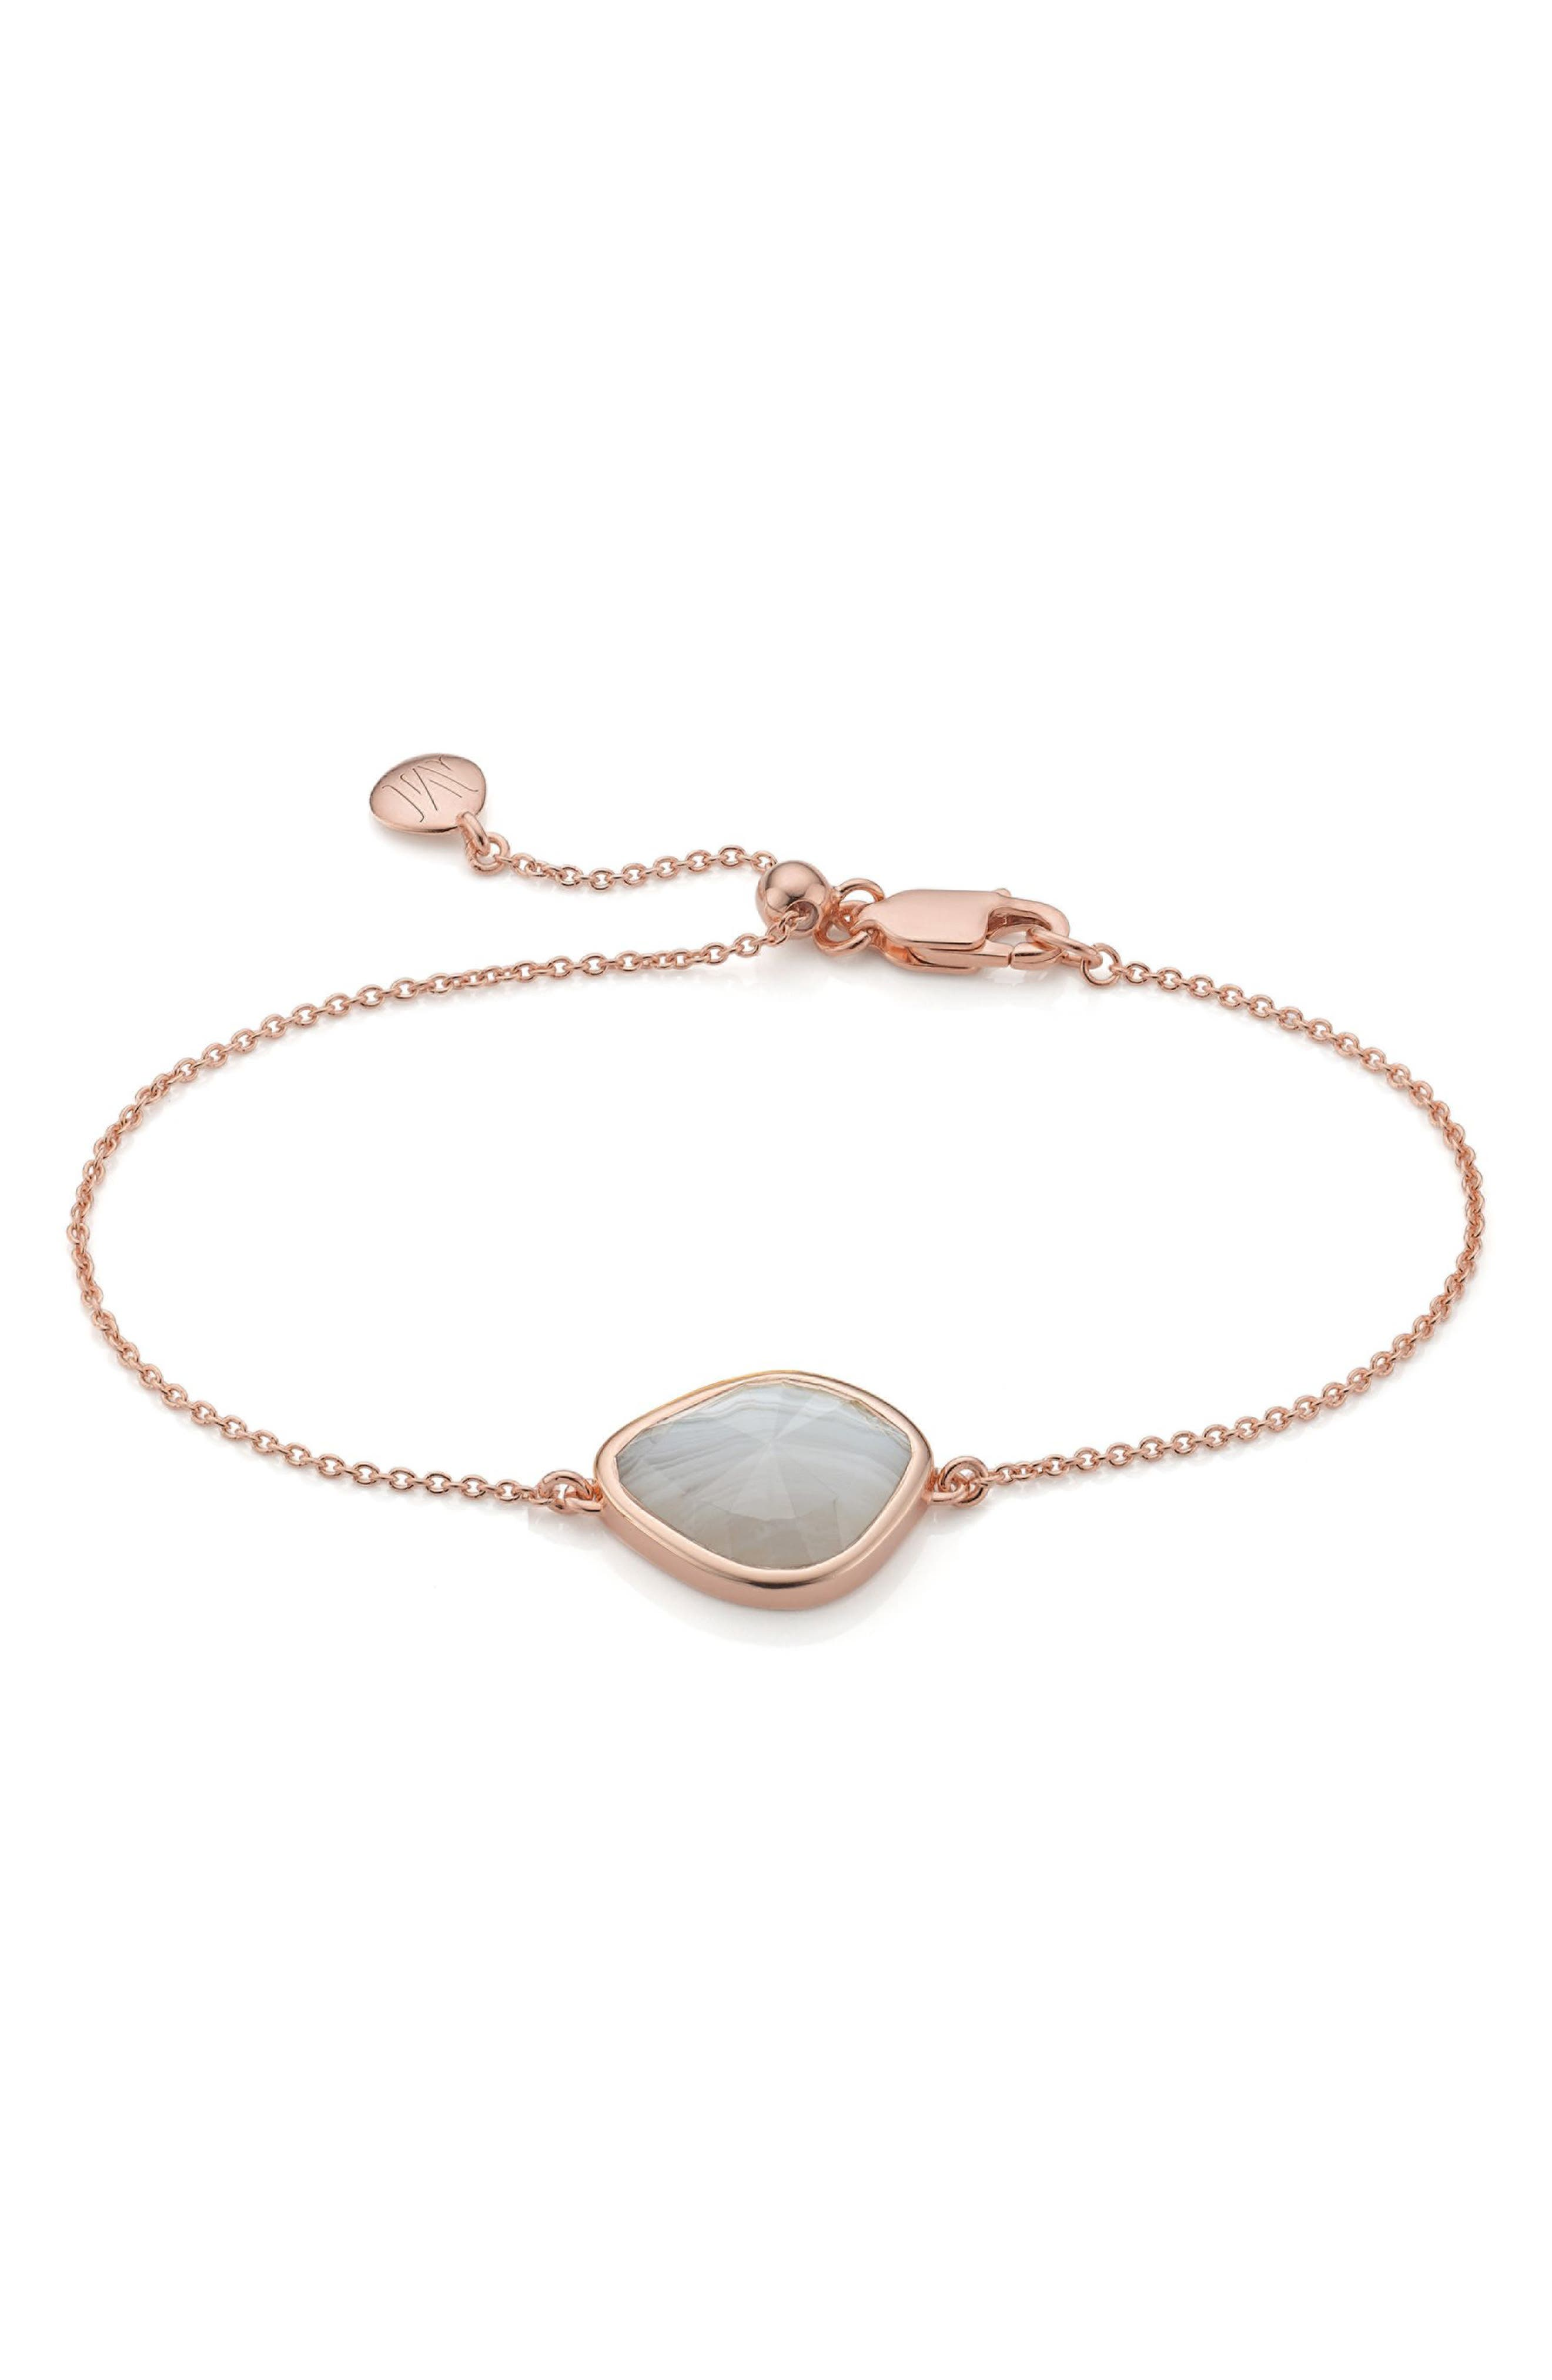 Monica Vinader Siren Nugget Bracelet